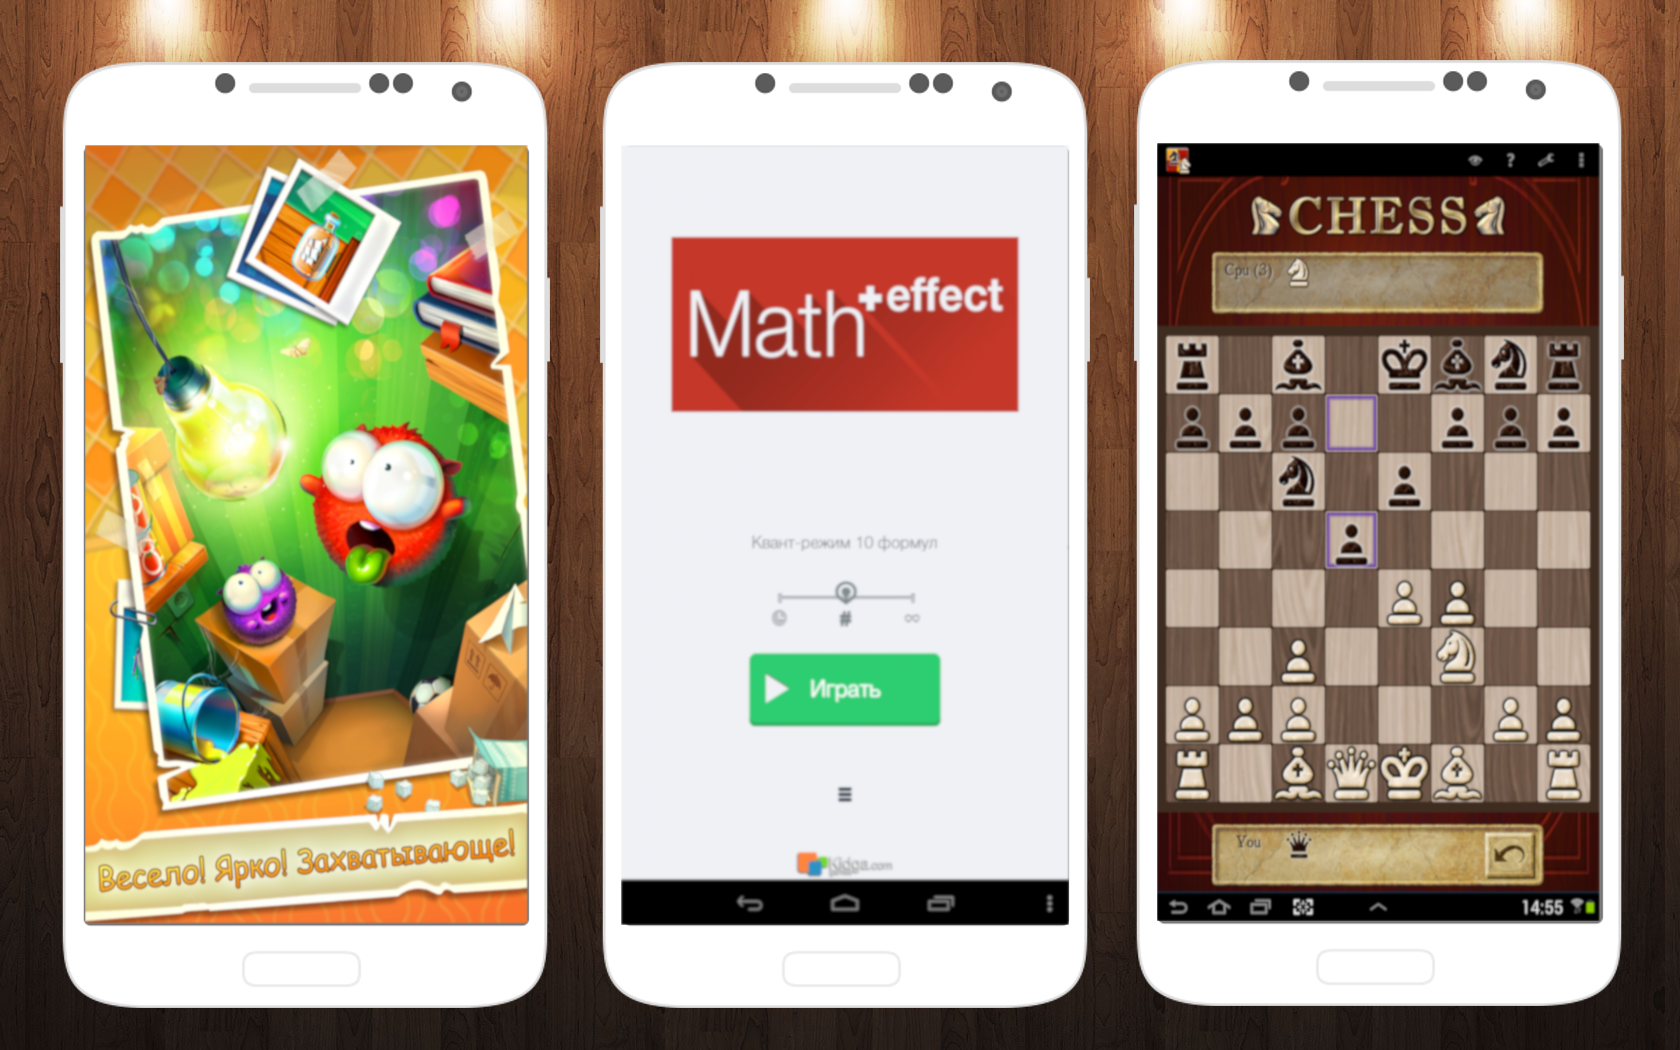 Умные игры для Android: Lightomania, Math Effect и Chess Free